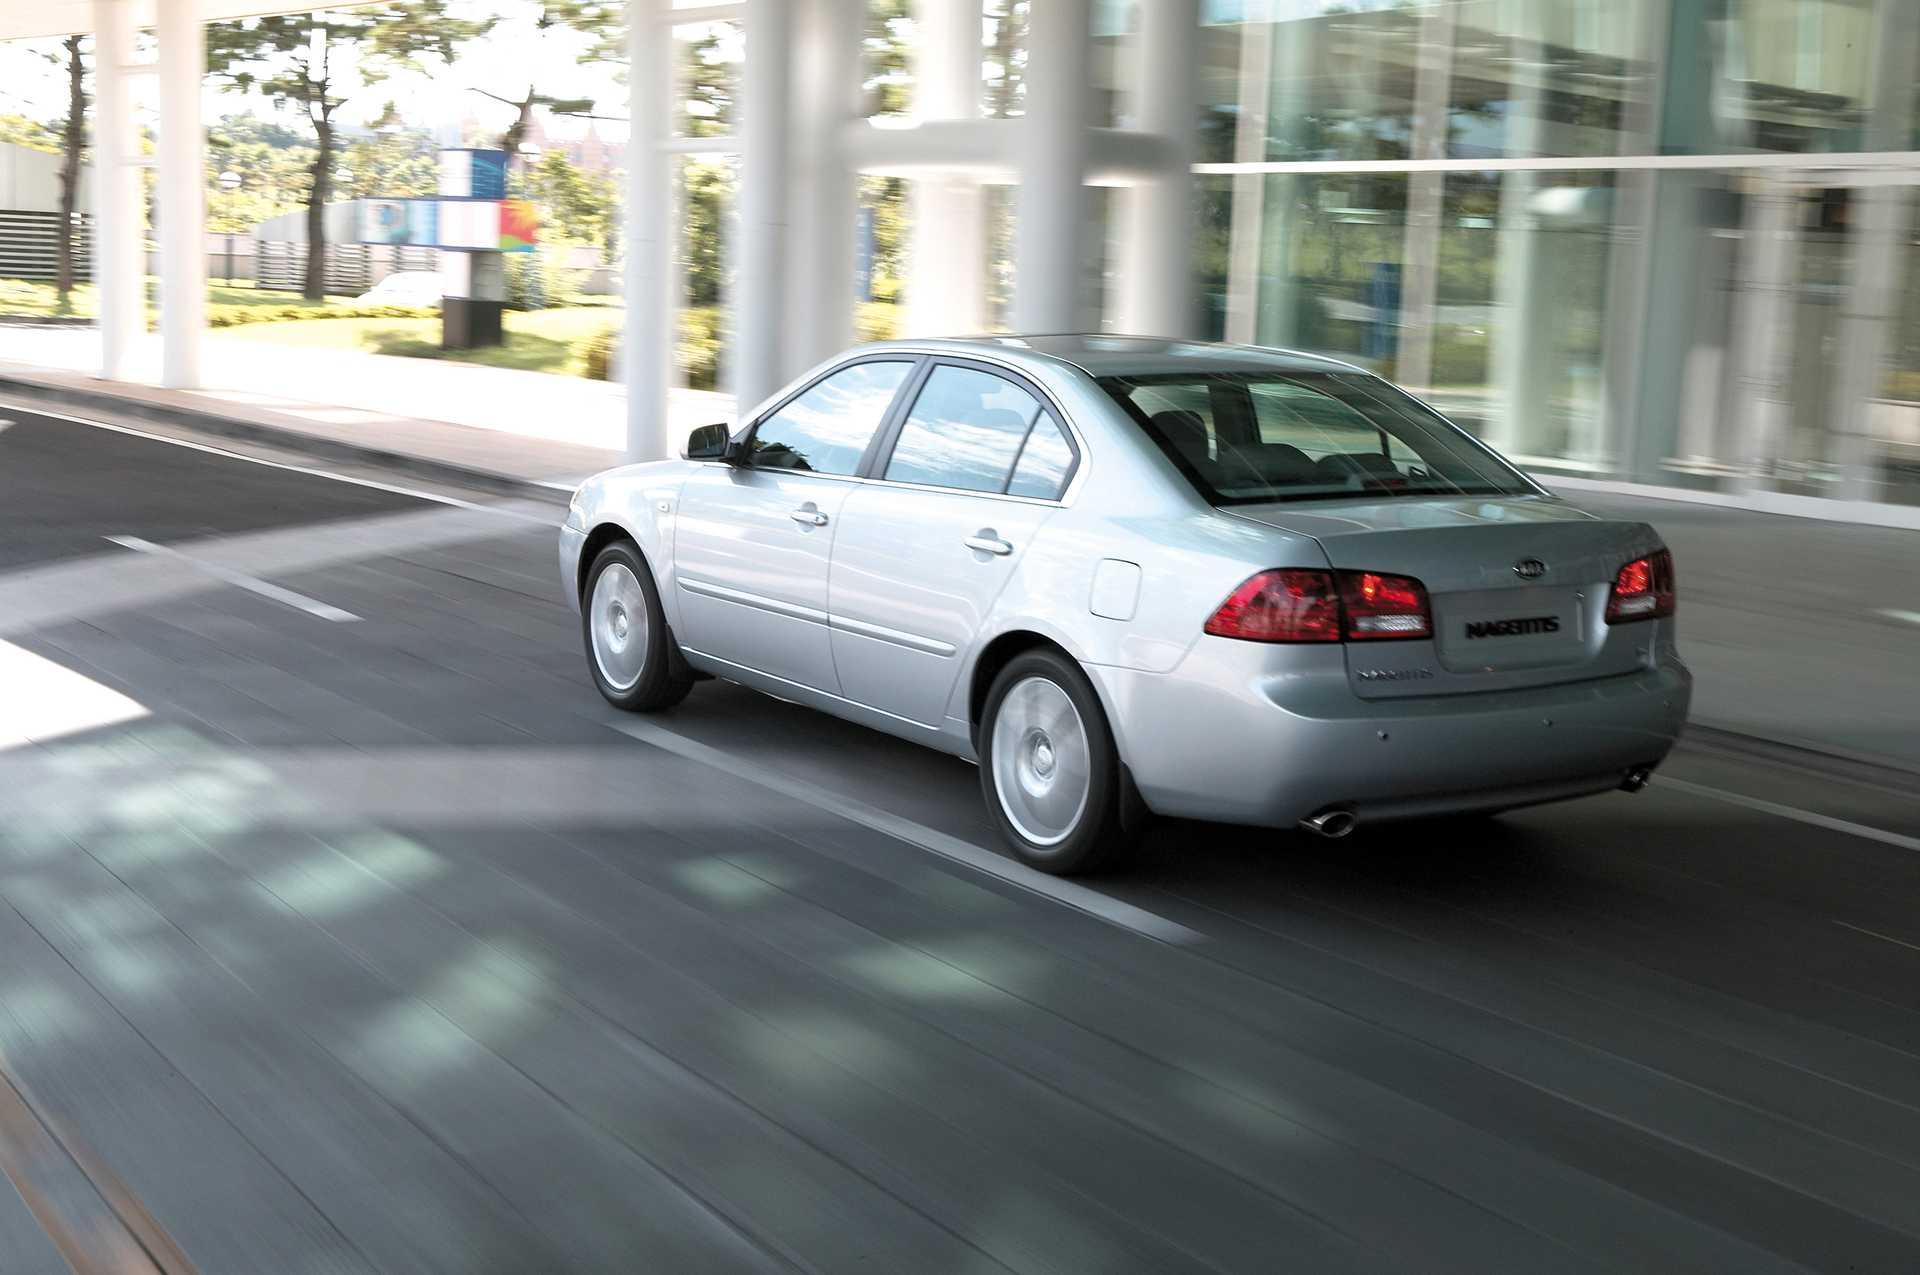 Kia Magentis 2.7 V6 188hp, 2006